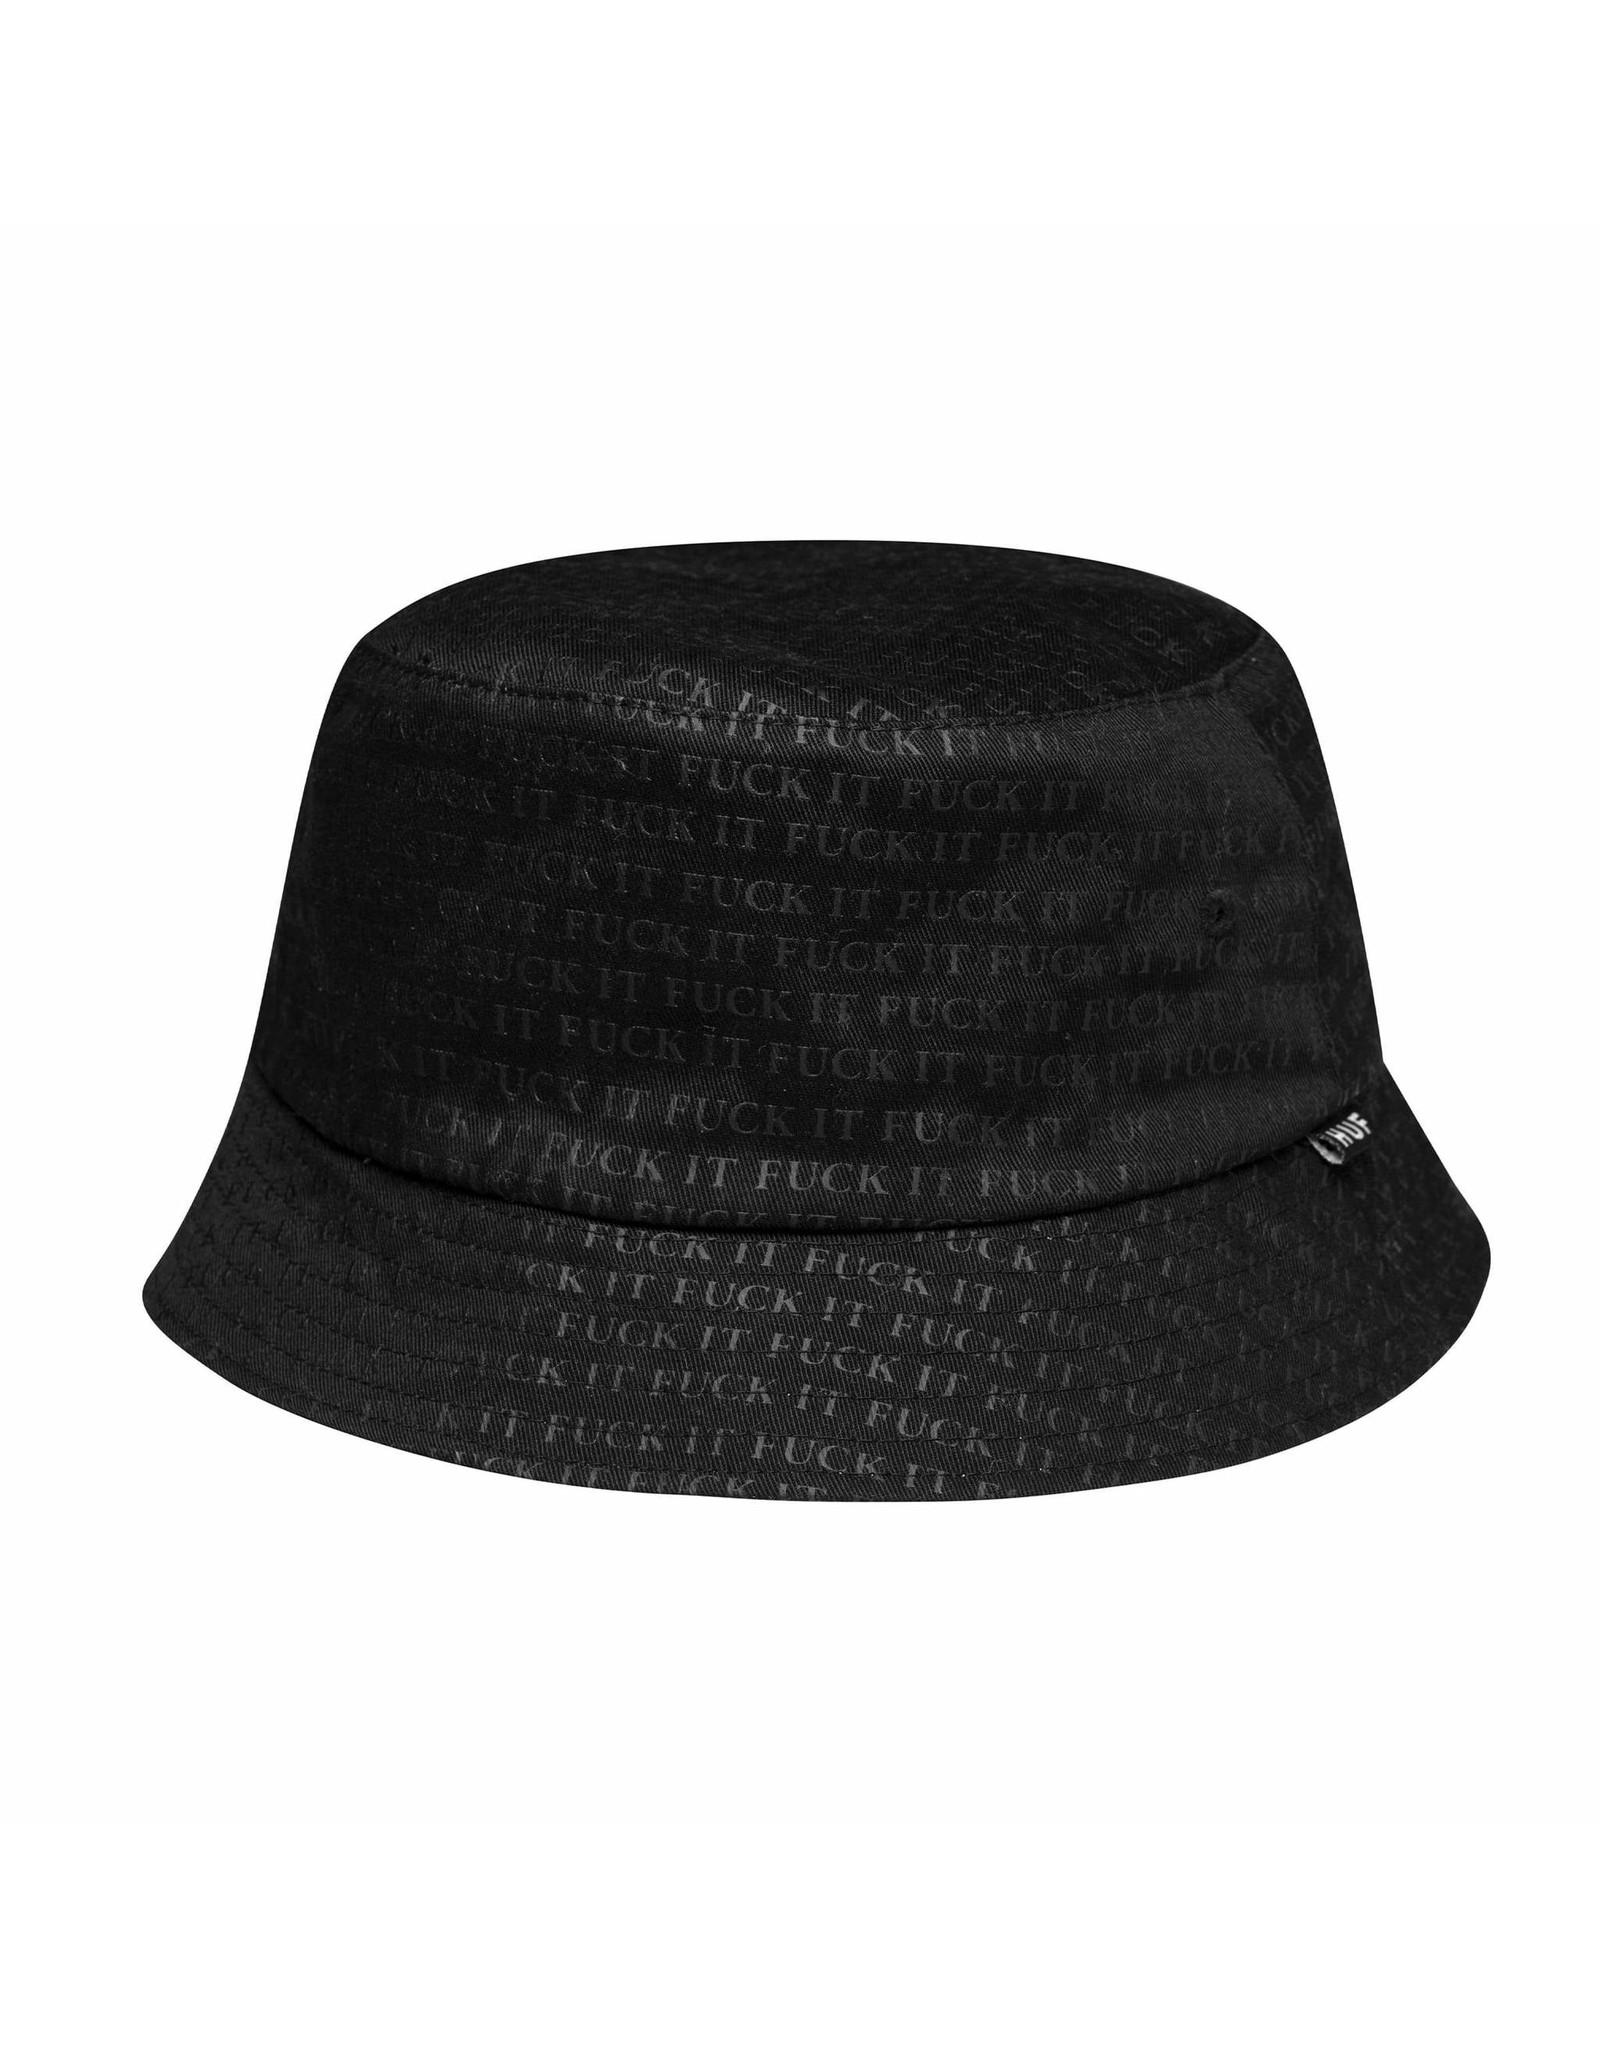 HUF Fuck It Reversible Bucket Hat - Black/White